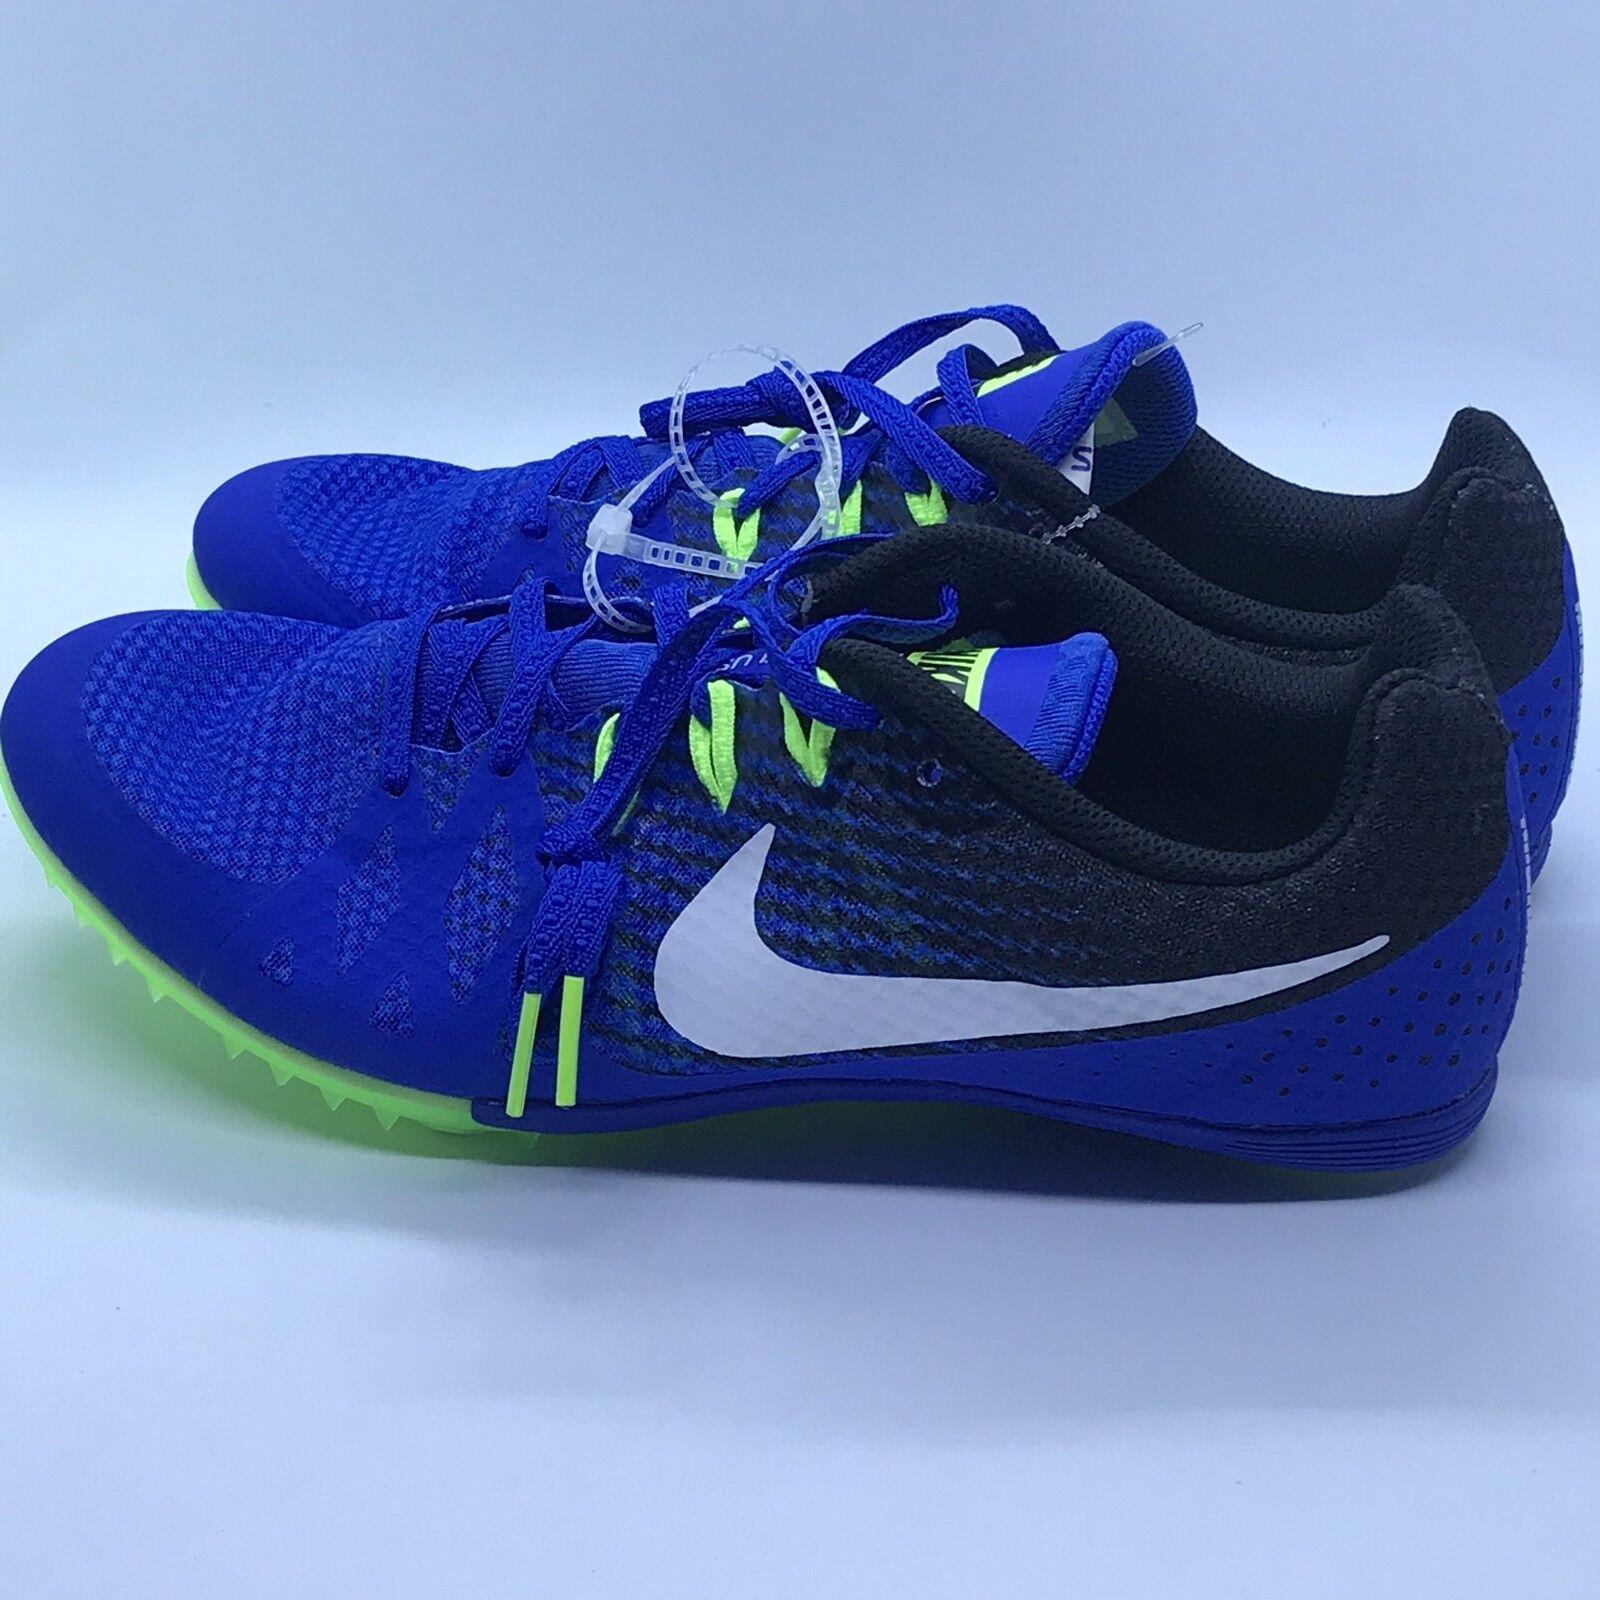 Nike Zoom Rival M 8 Track Field Sprint Spikes shoes Sz 11.5 blueeGreen 806555-413